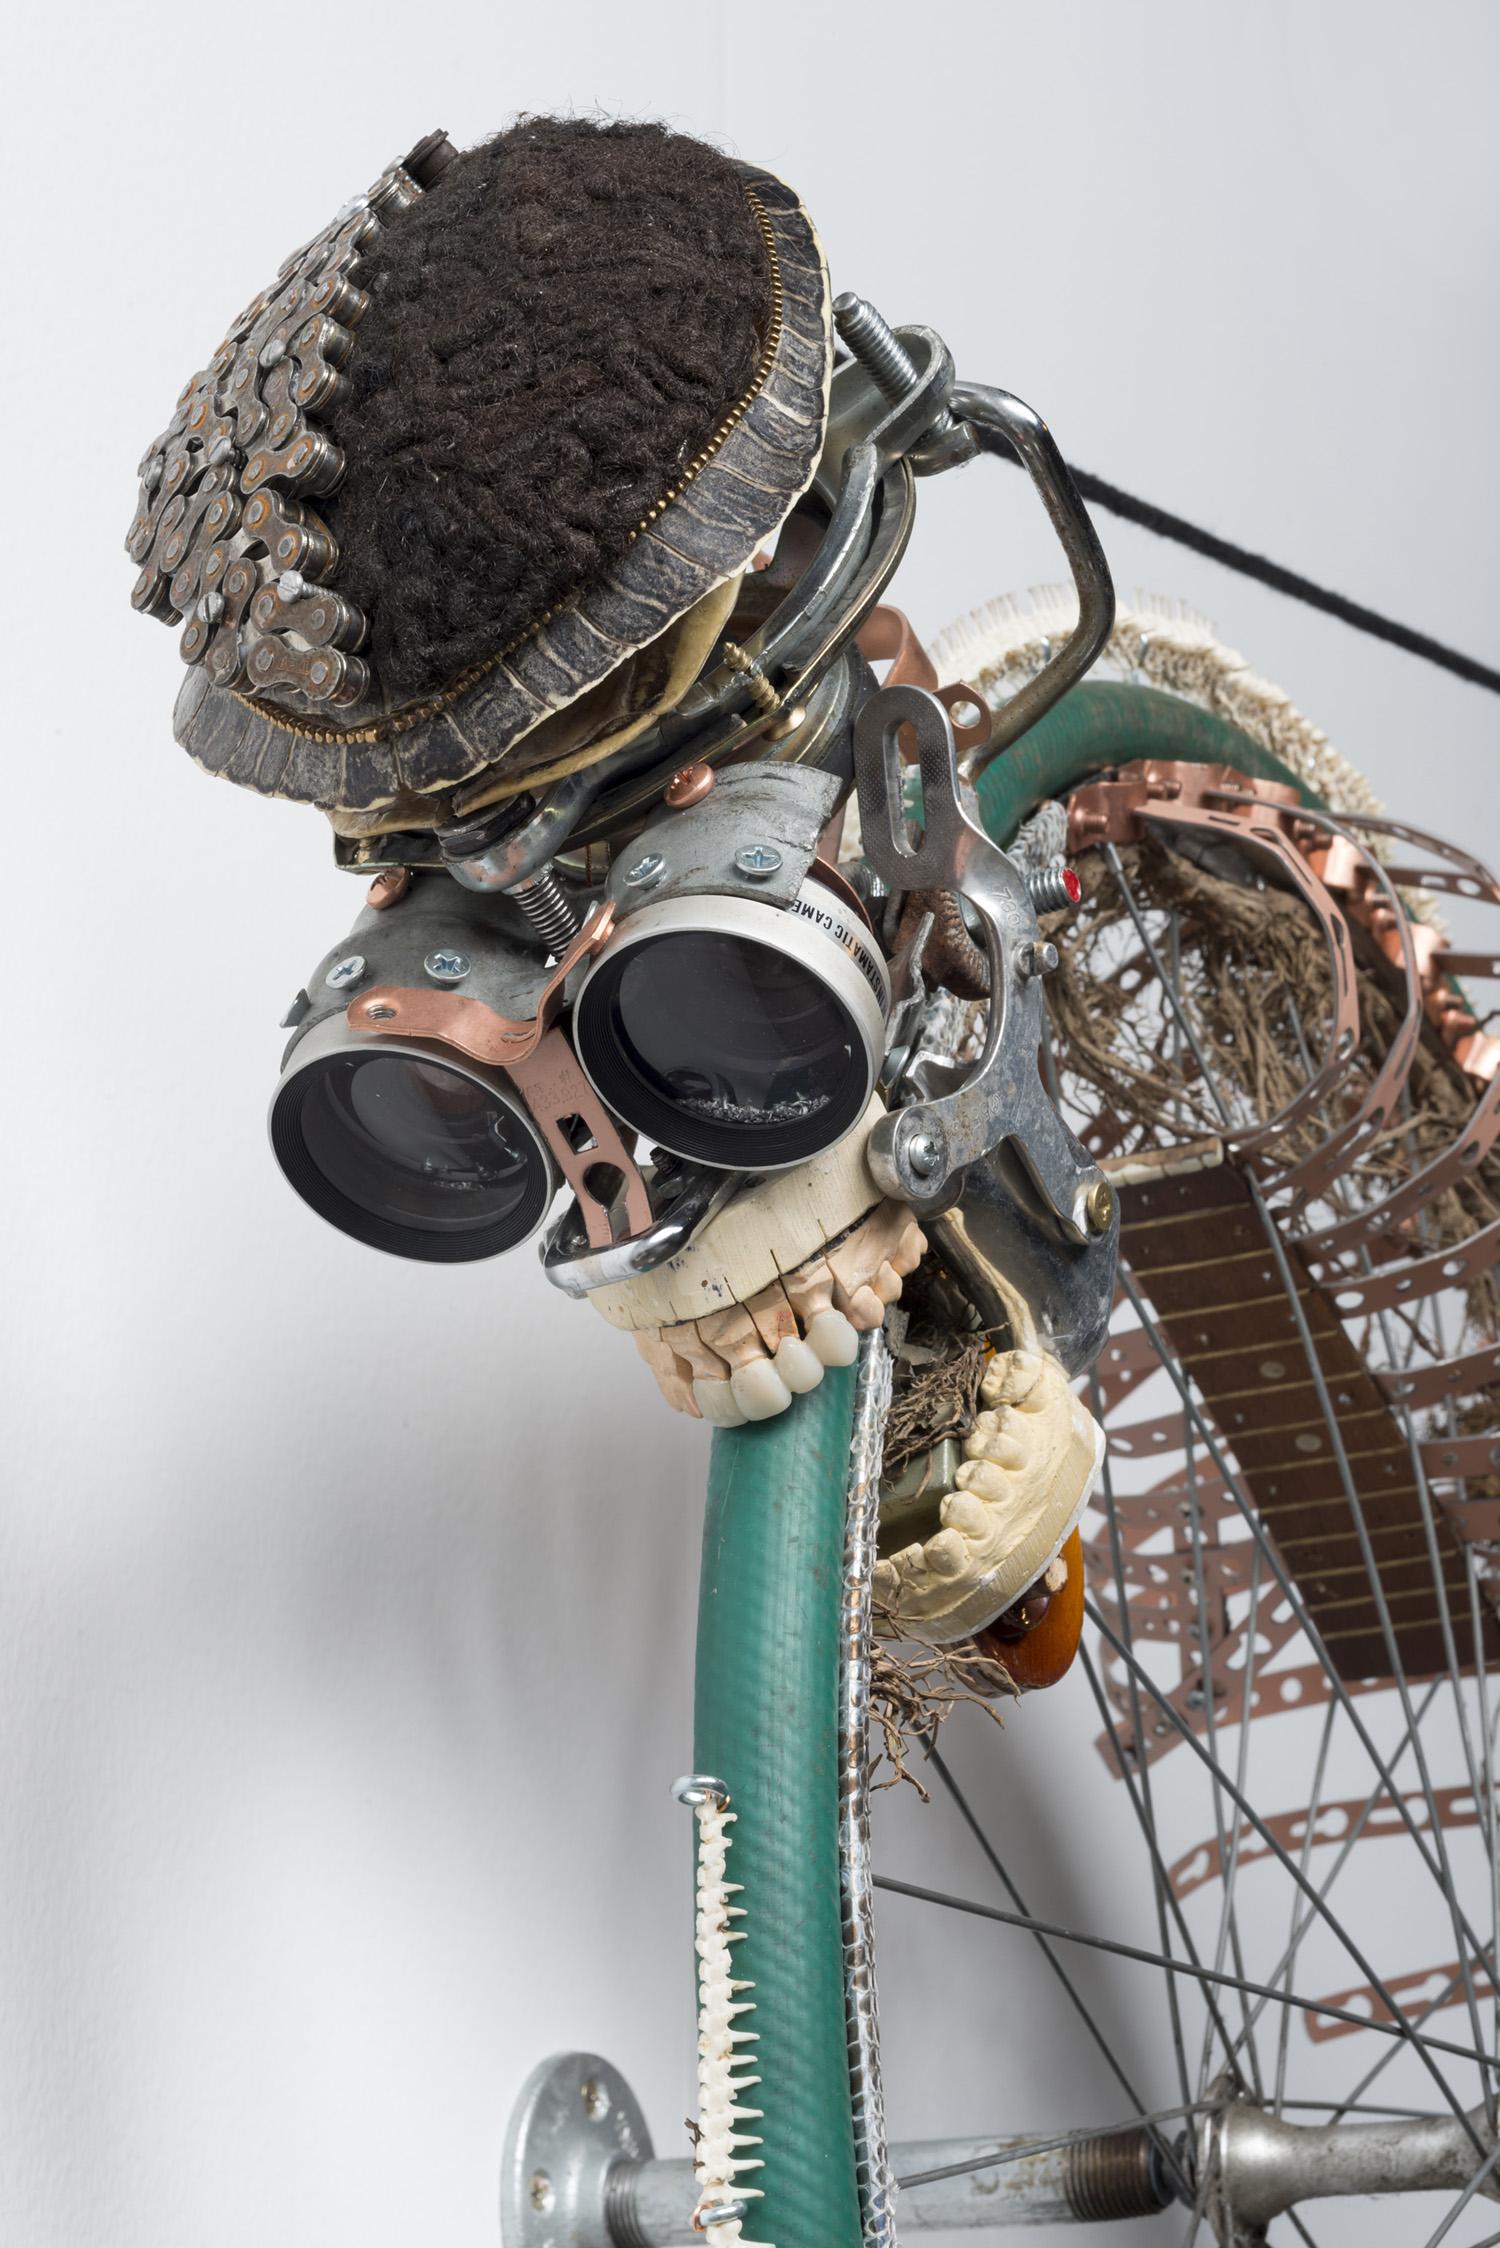 Lorna Williams-Ouroboros-2013-hair, plumbing hardware, violin parts, photography lenses, snake vertebrae, bike wheel, hose, ukulele neck, bike chain, plaster teeth, bike seat, speaker, snake shedding, root, rope, cement-88x60x13-detail.jpg